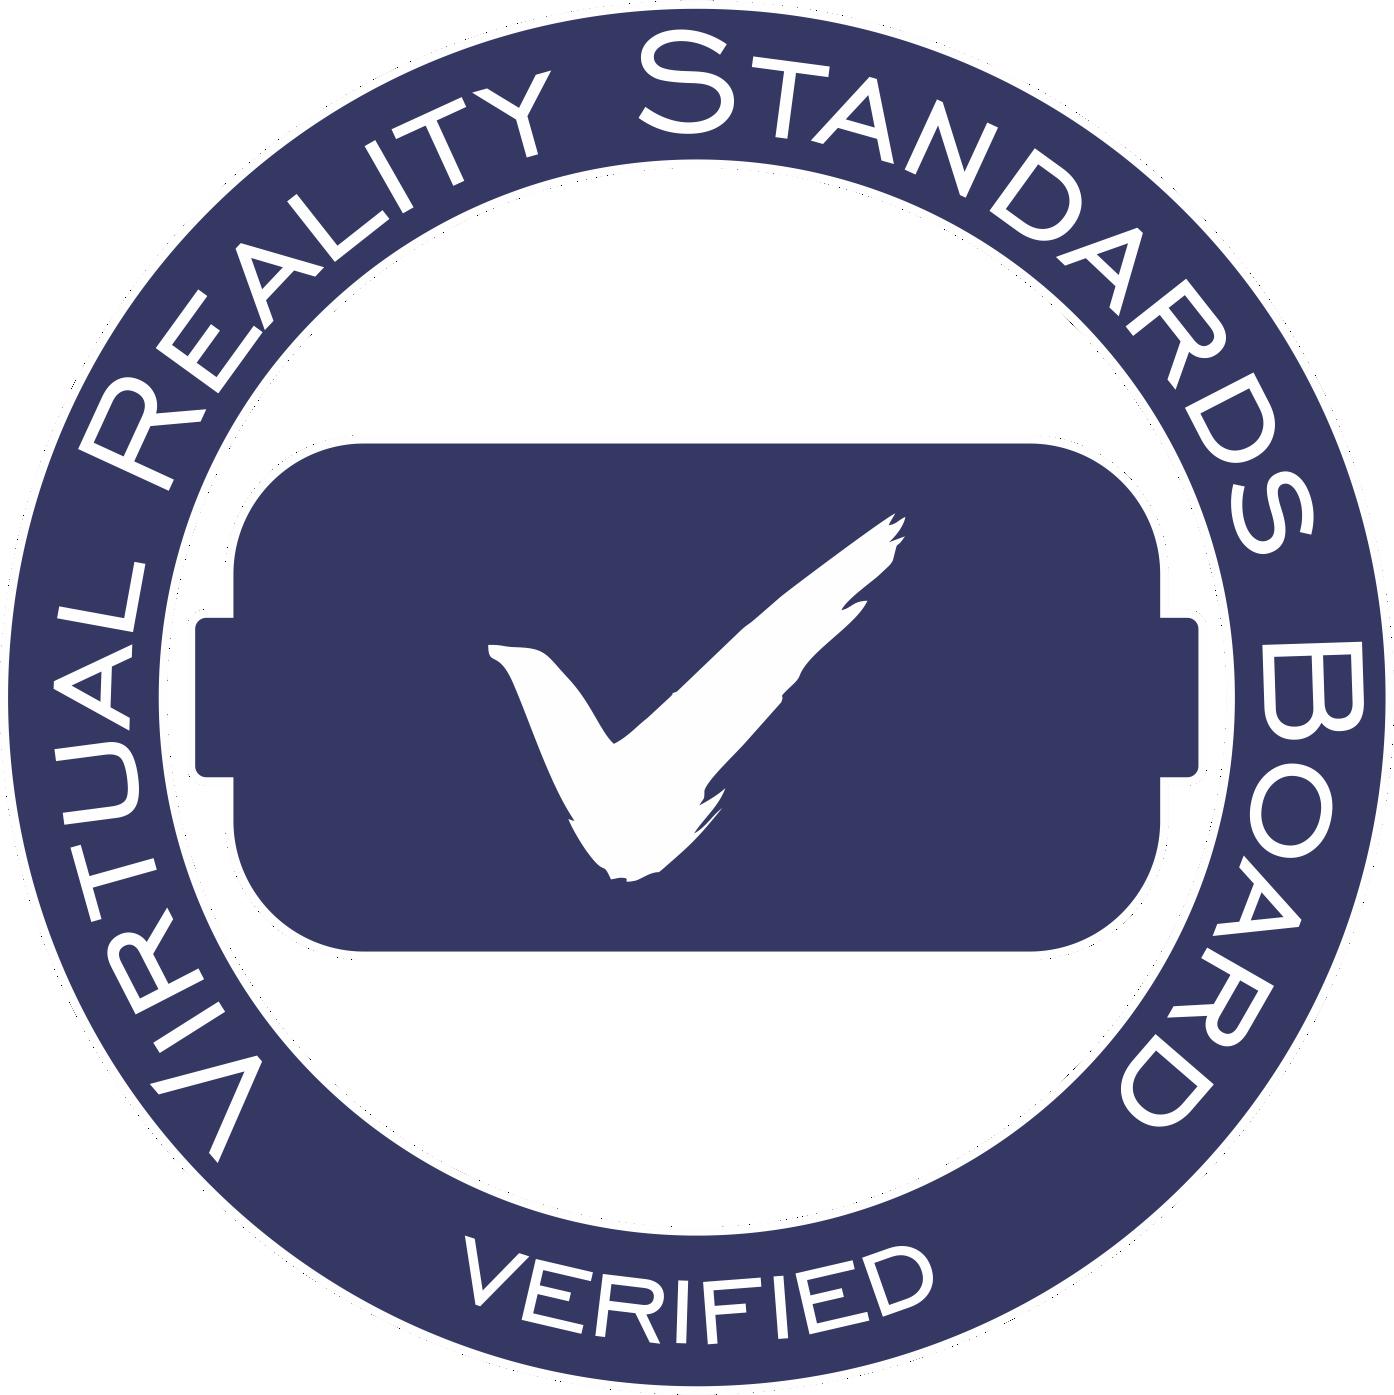 VRSB Verified